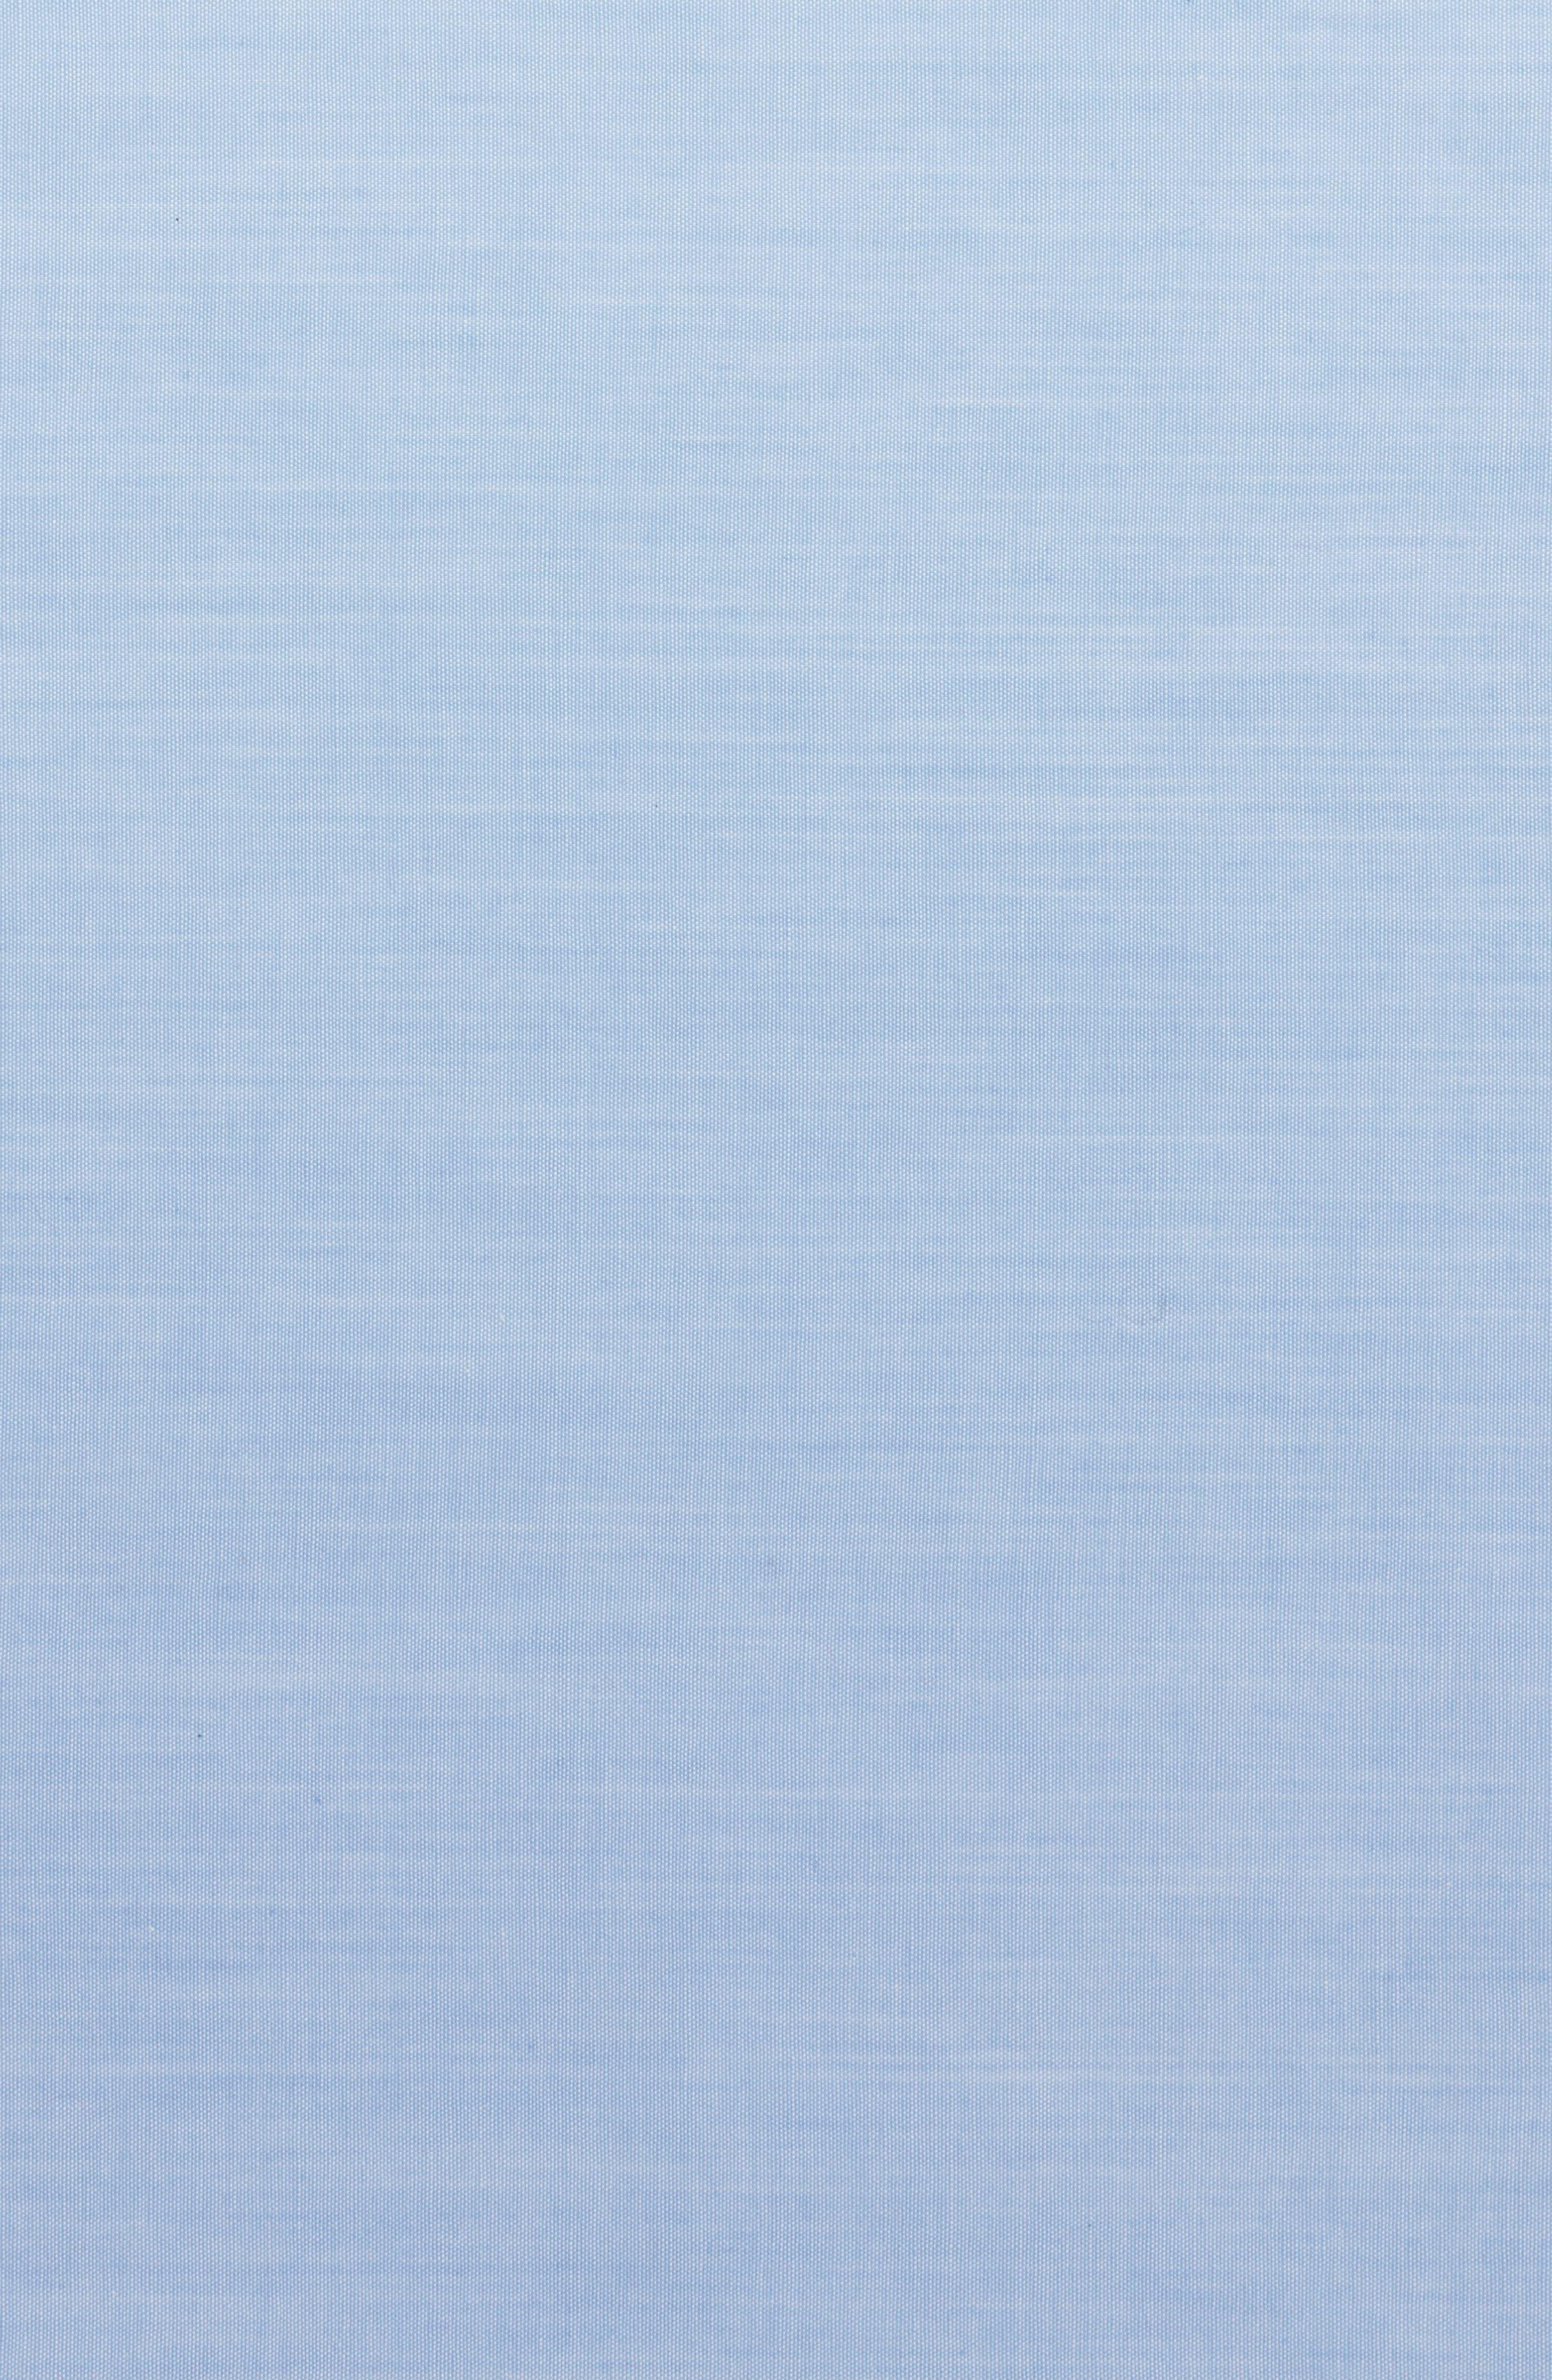 Chambray CottonPocket Square,                             Alternate thumbnail 4, color,                             455